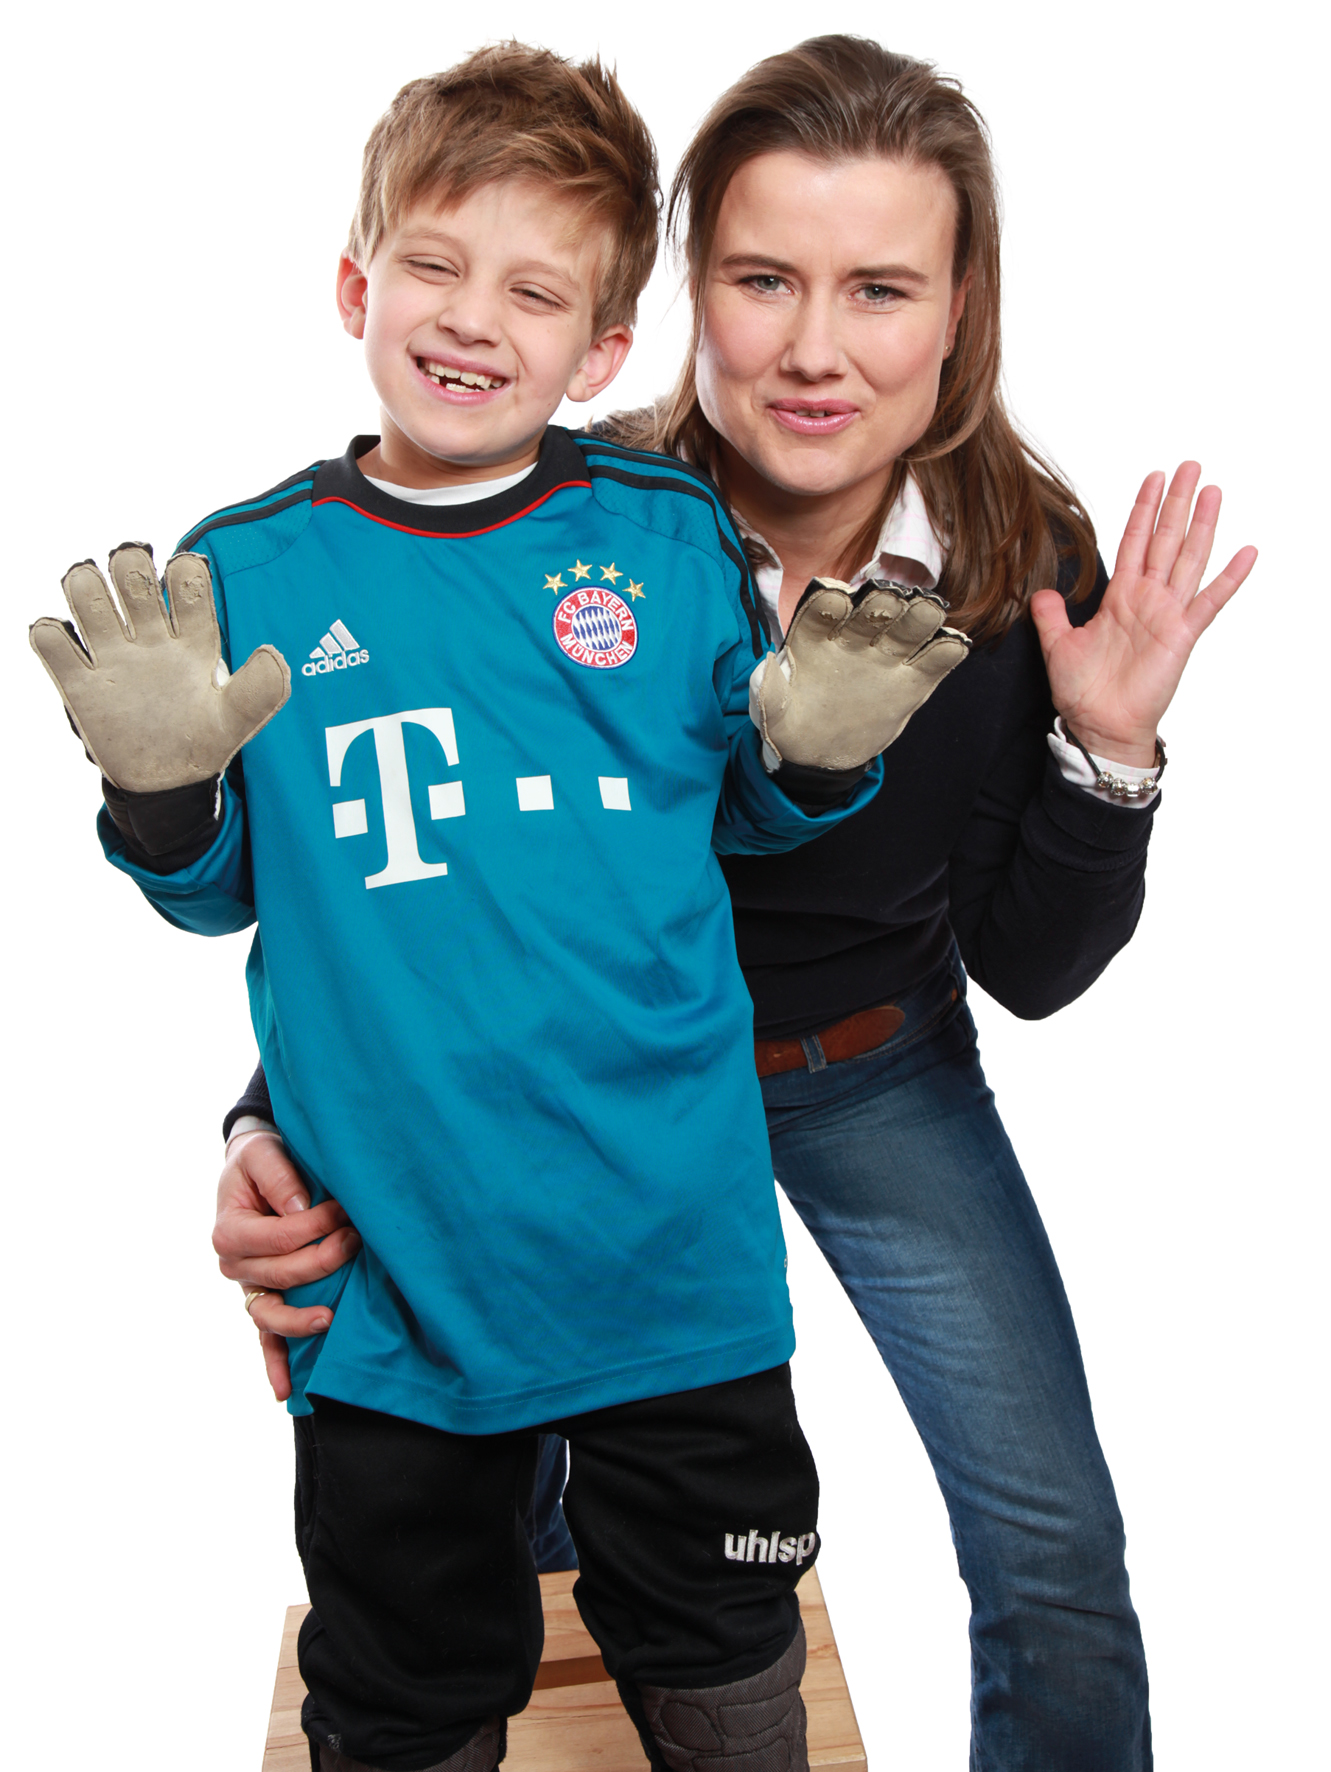 Paul Mutter Neurofibromatose Leben Kind Junge Bundesverband Selbsthilfe